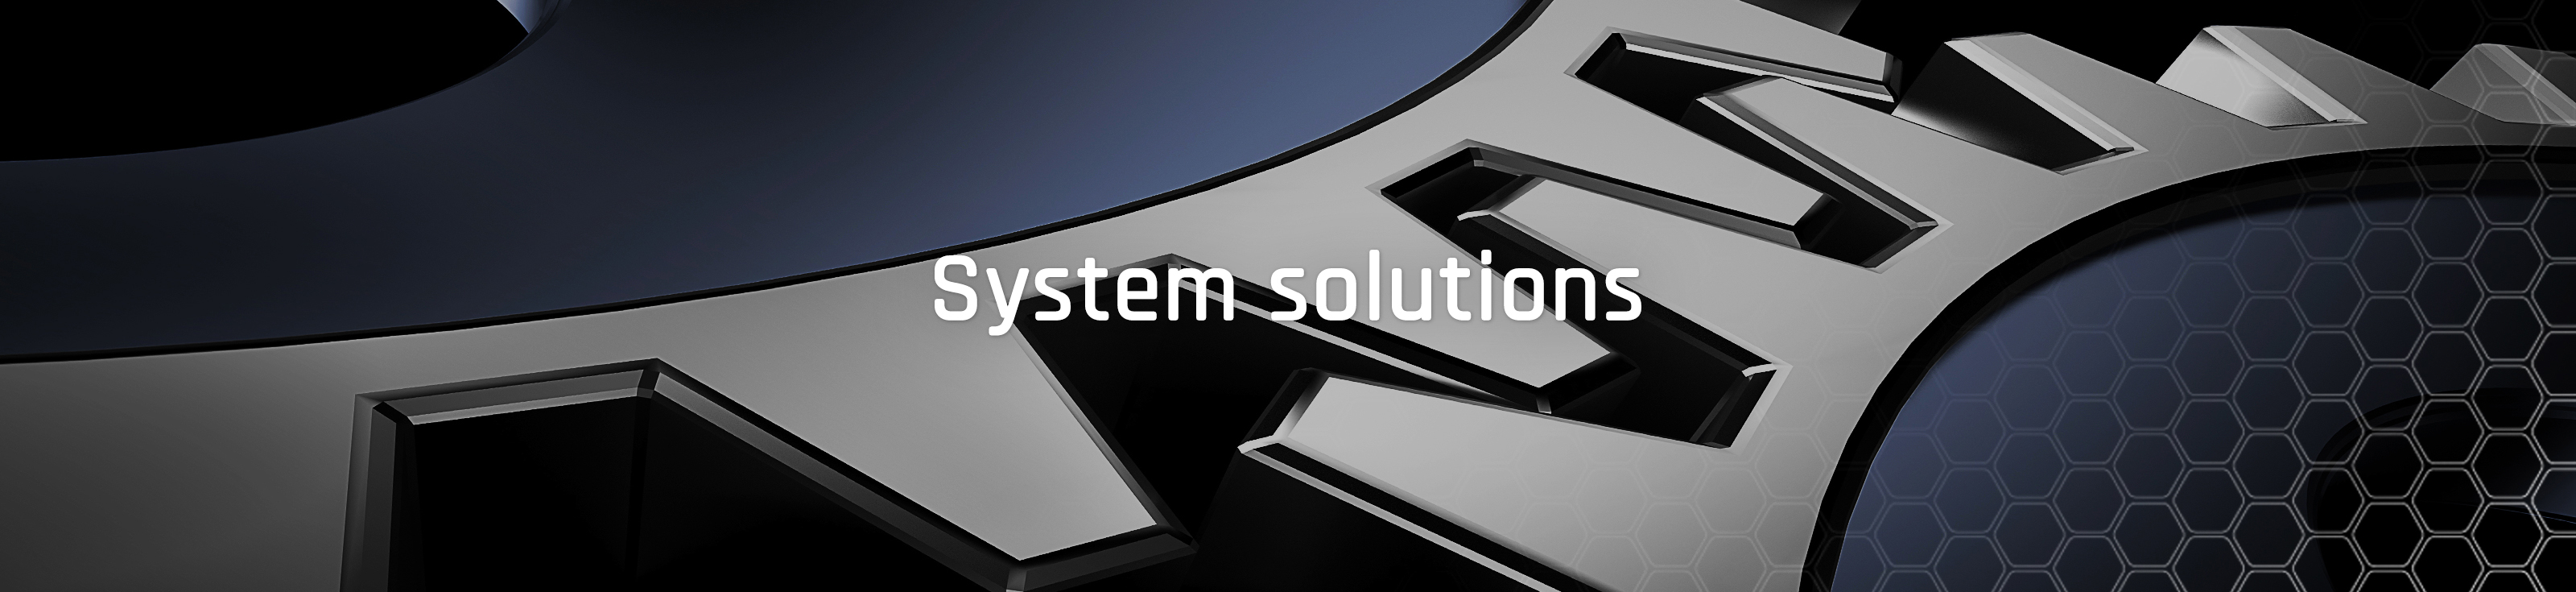 slider_System_solutions